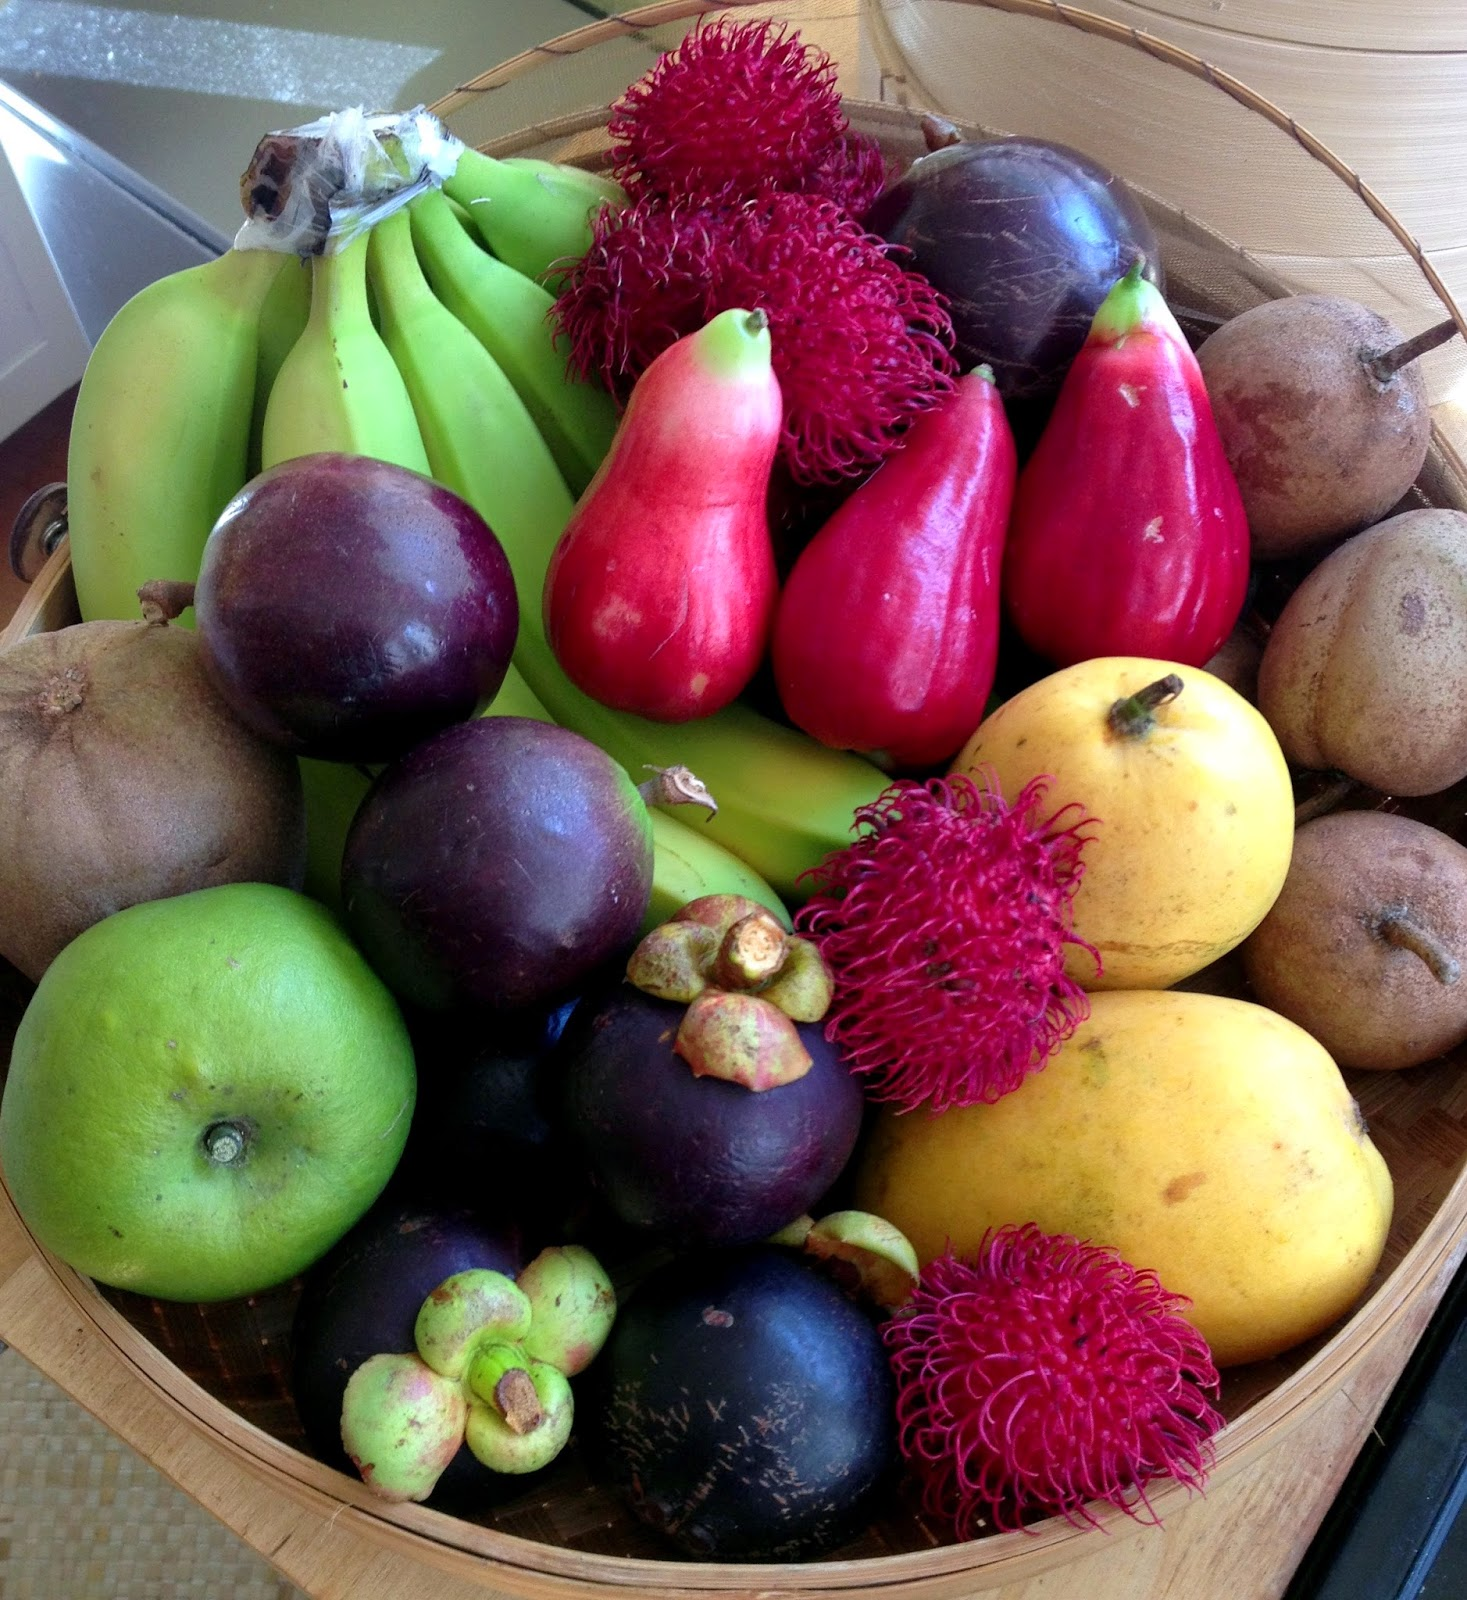 rambutans mangosteen chico sapodilla mamey sapote white sapote banana star apple mango and mountain apple